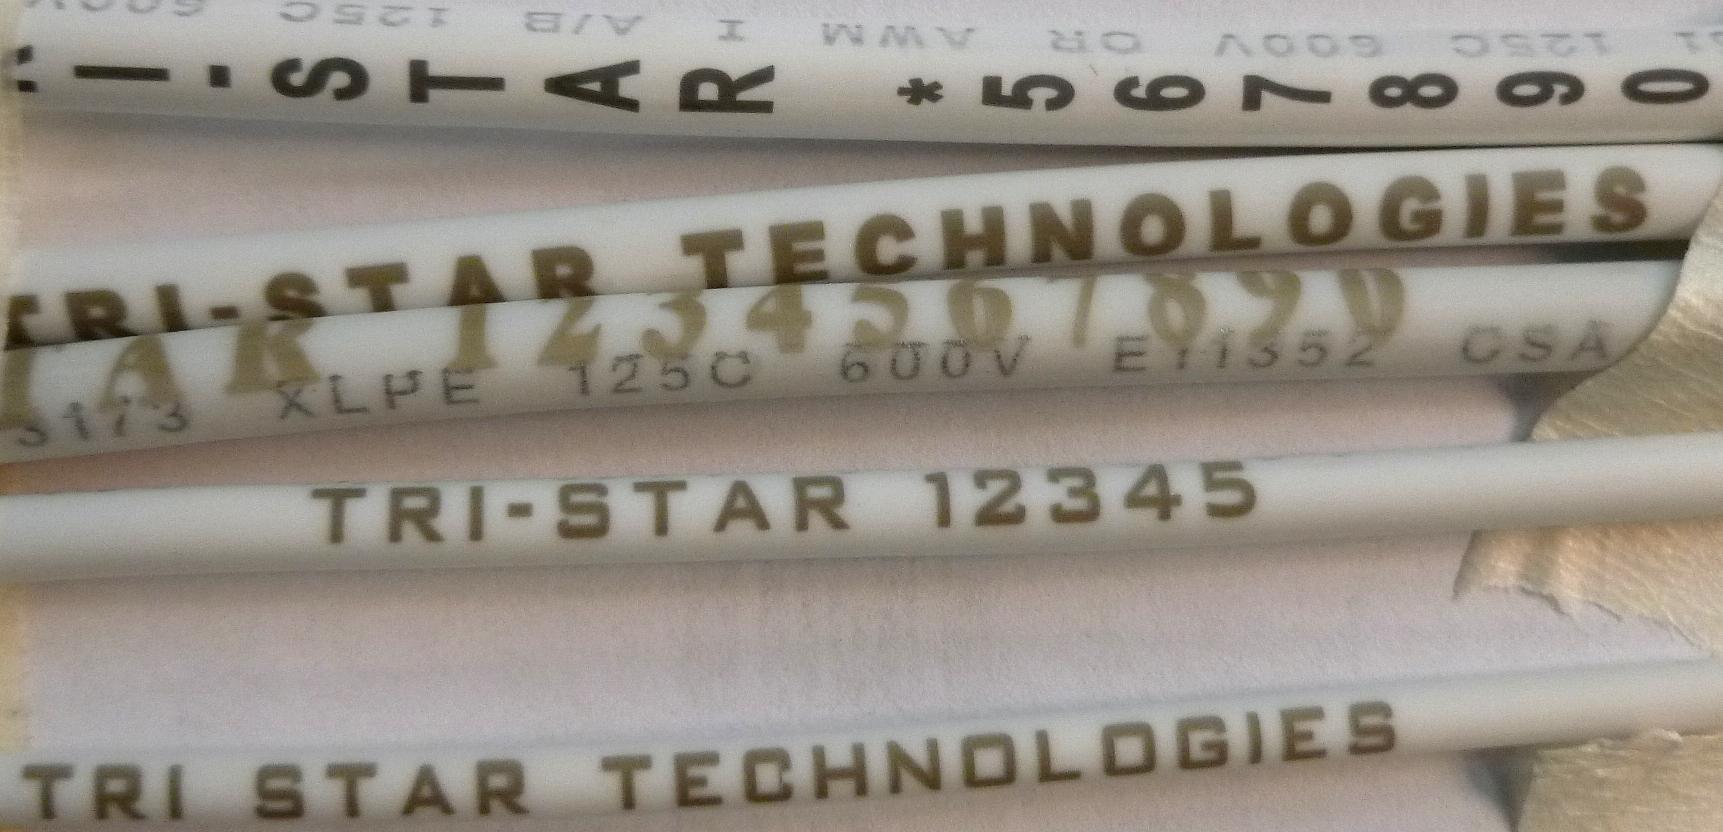 UV Laser Marked Wire Samples